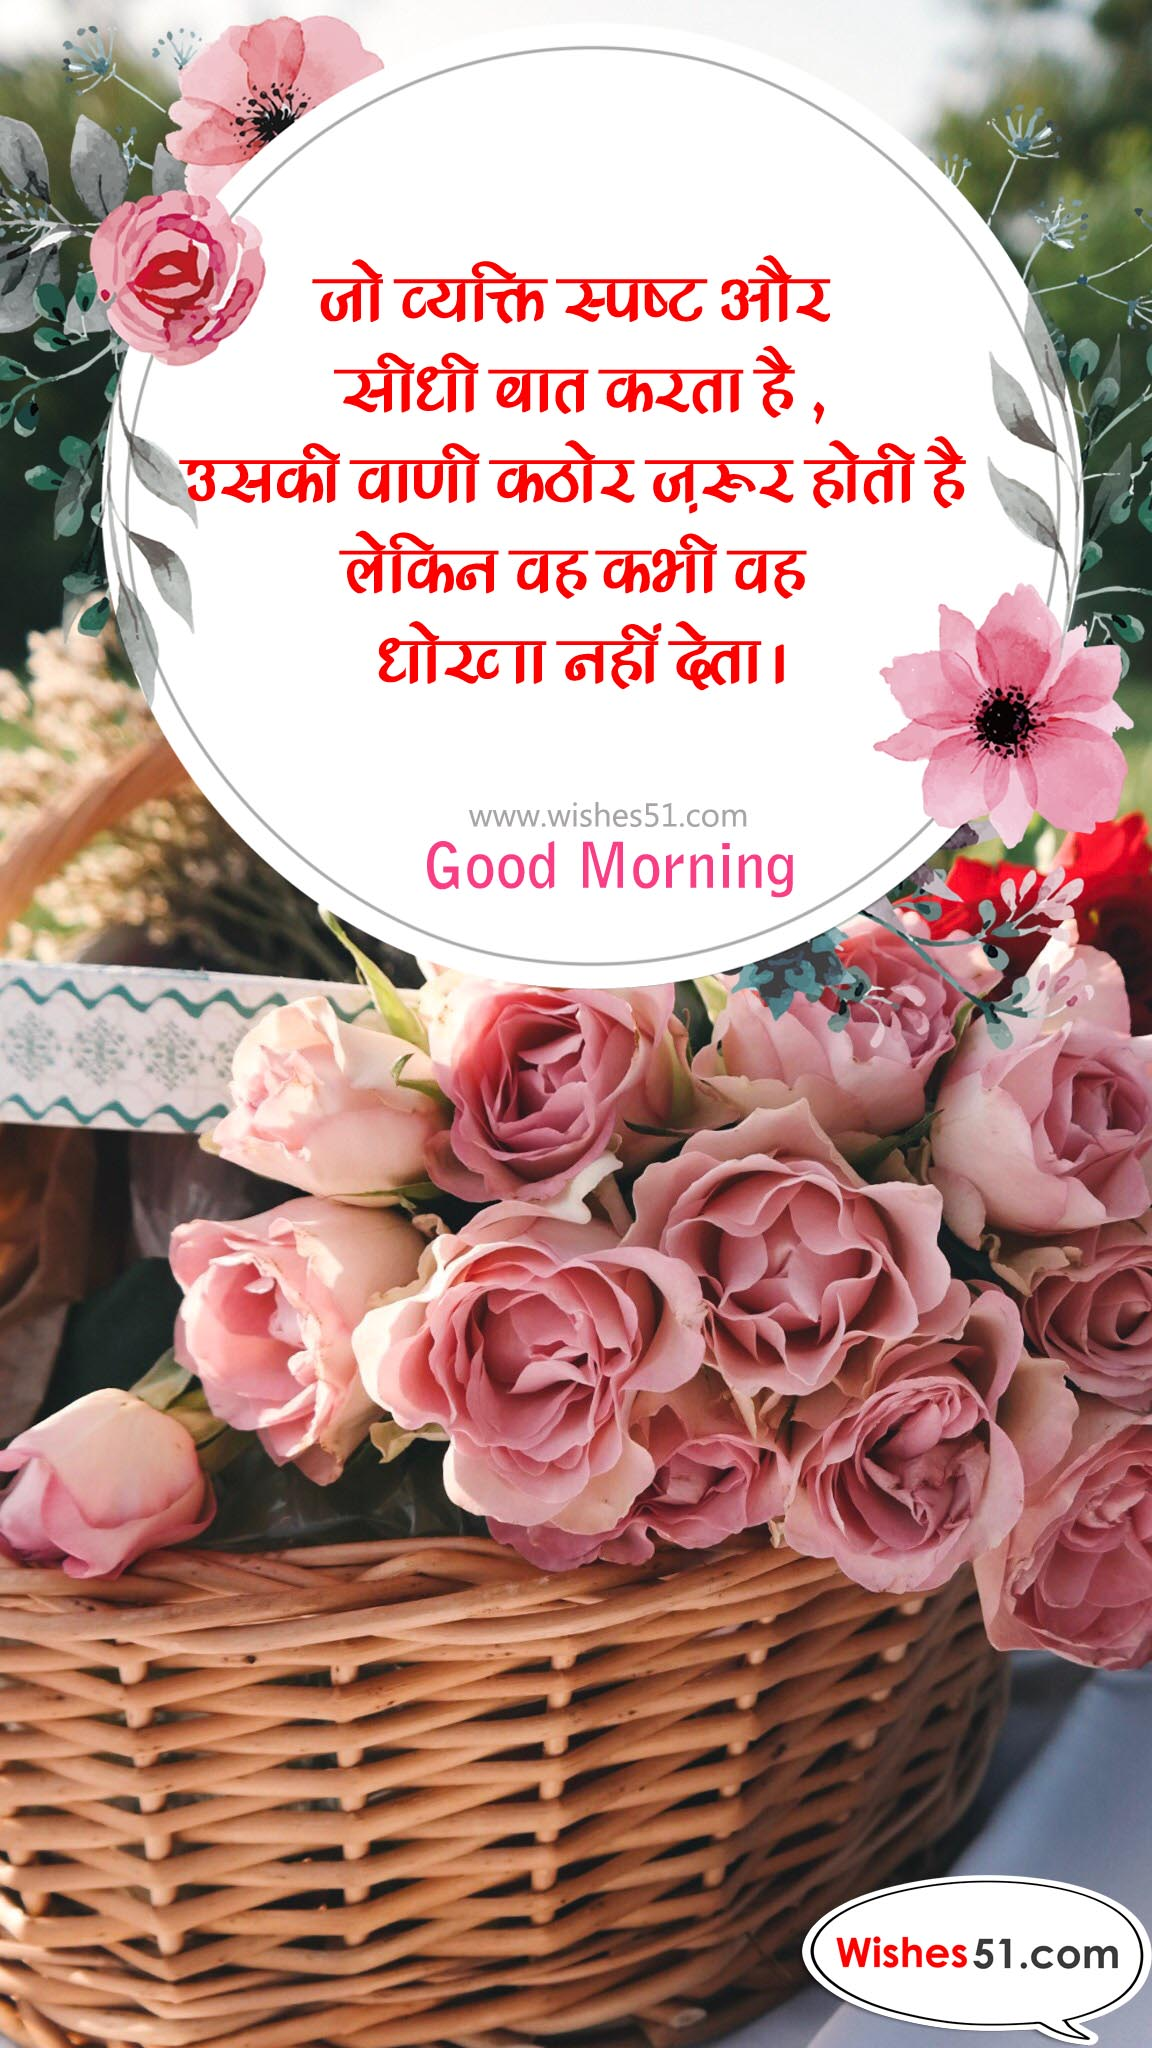 Top 11 Good Morning Status In Hindi Best Good Morning Quotes In Hindi